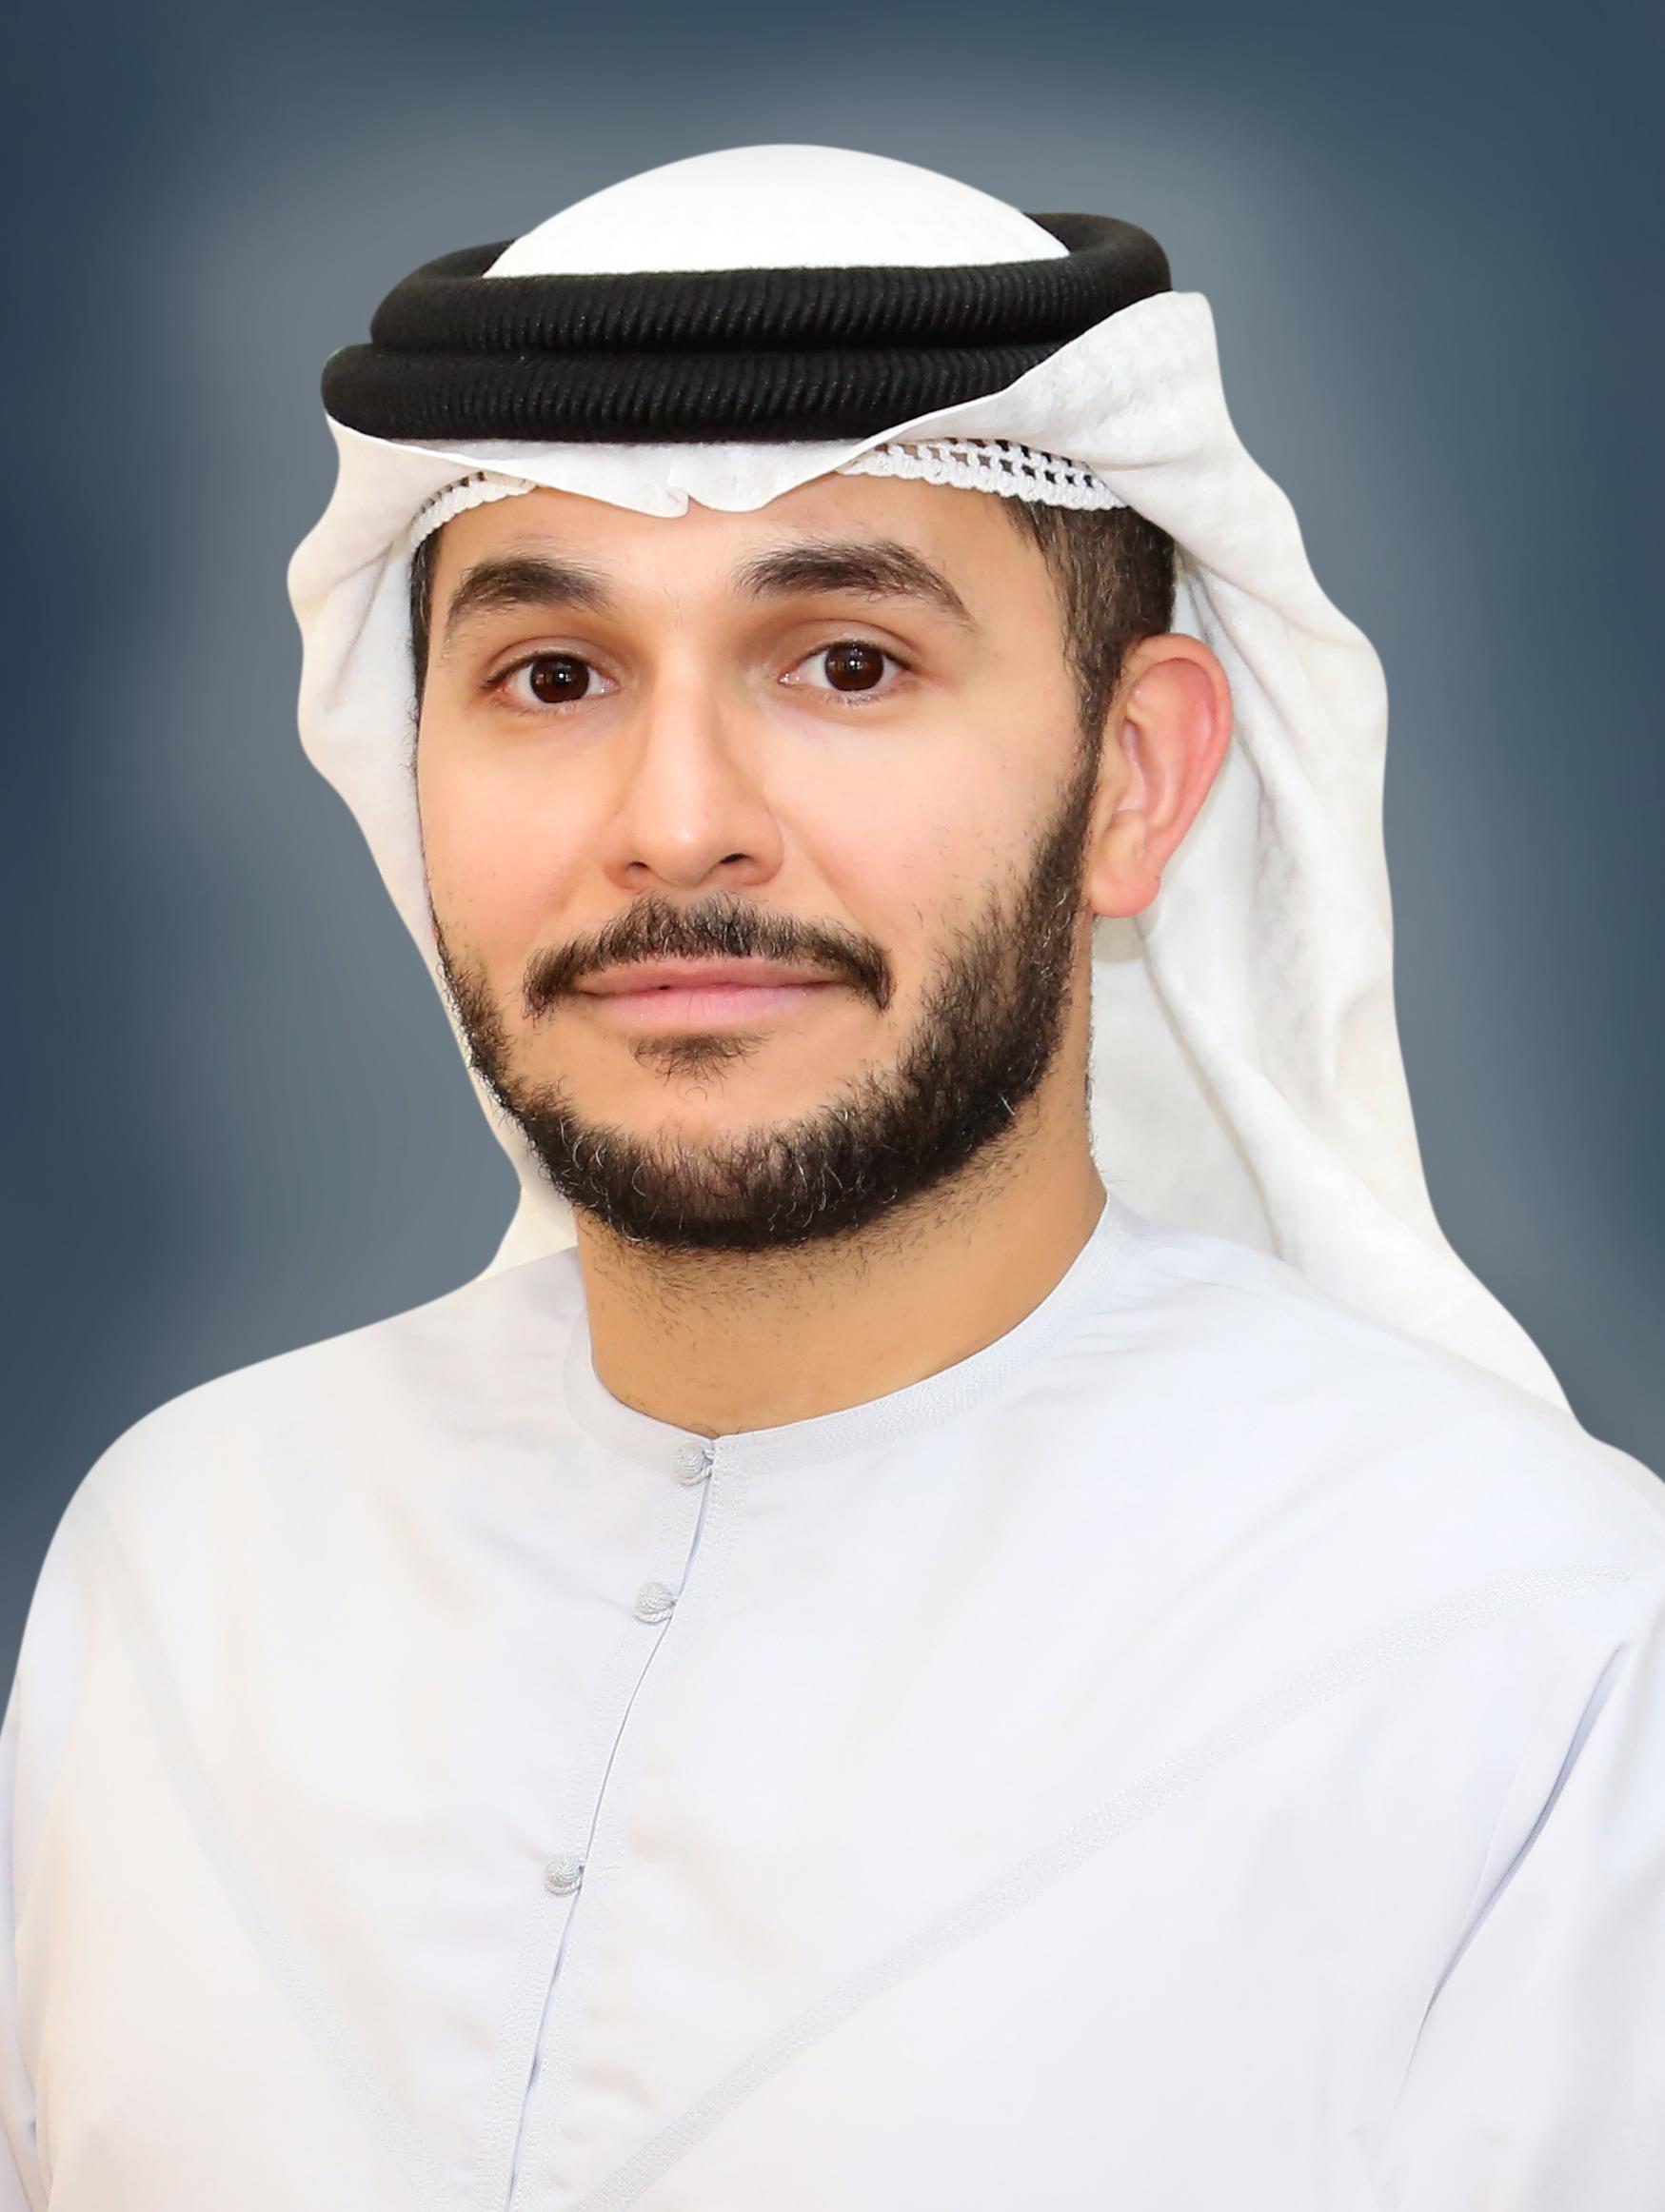 Mohammed Al Dah